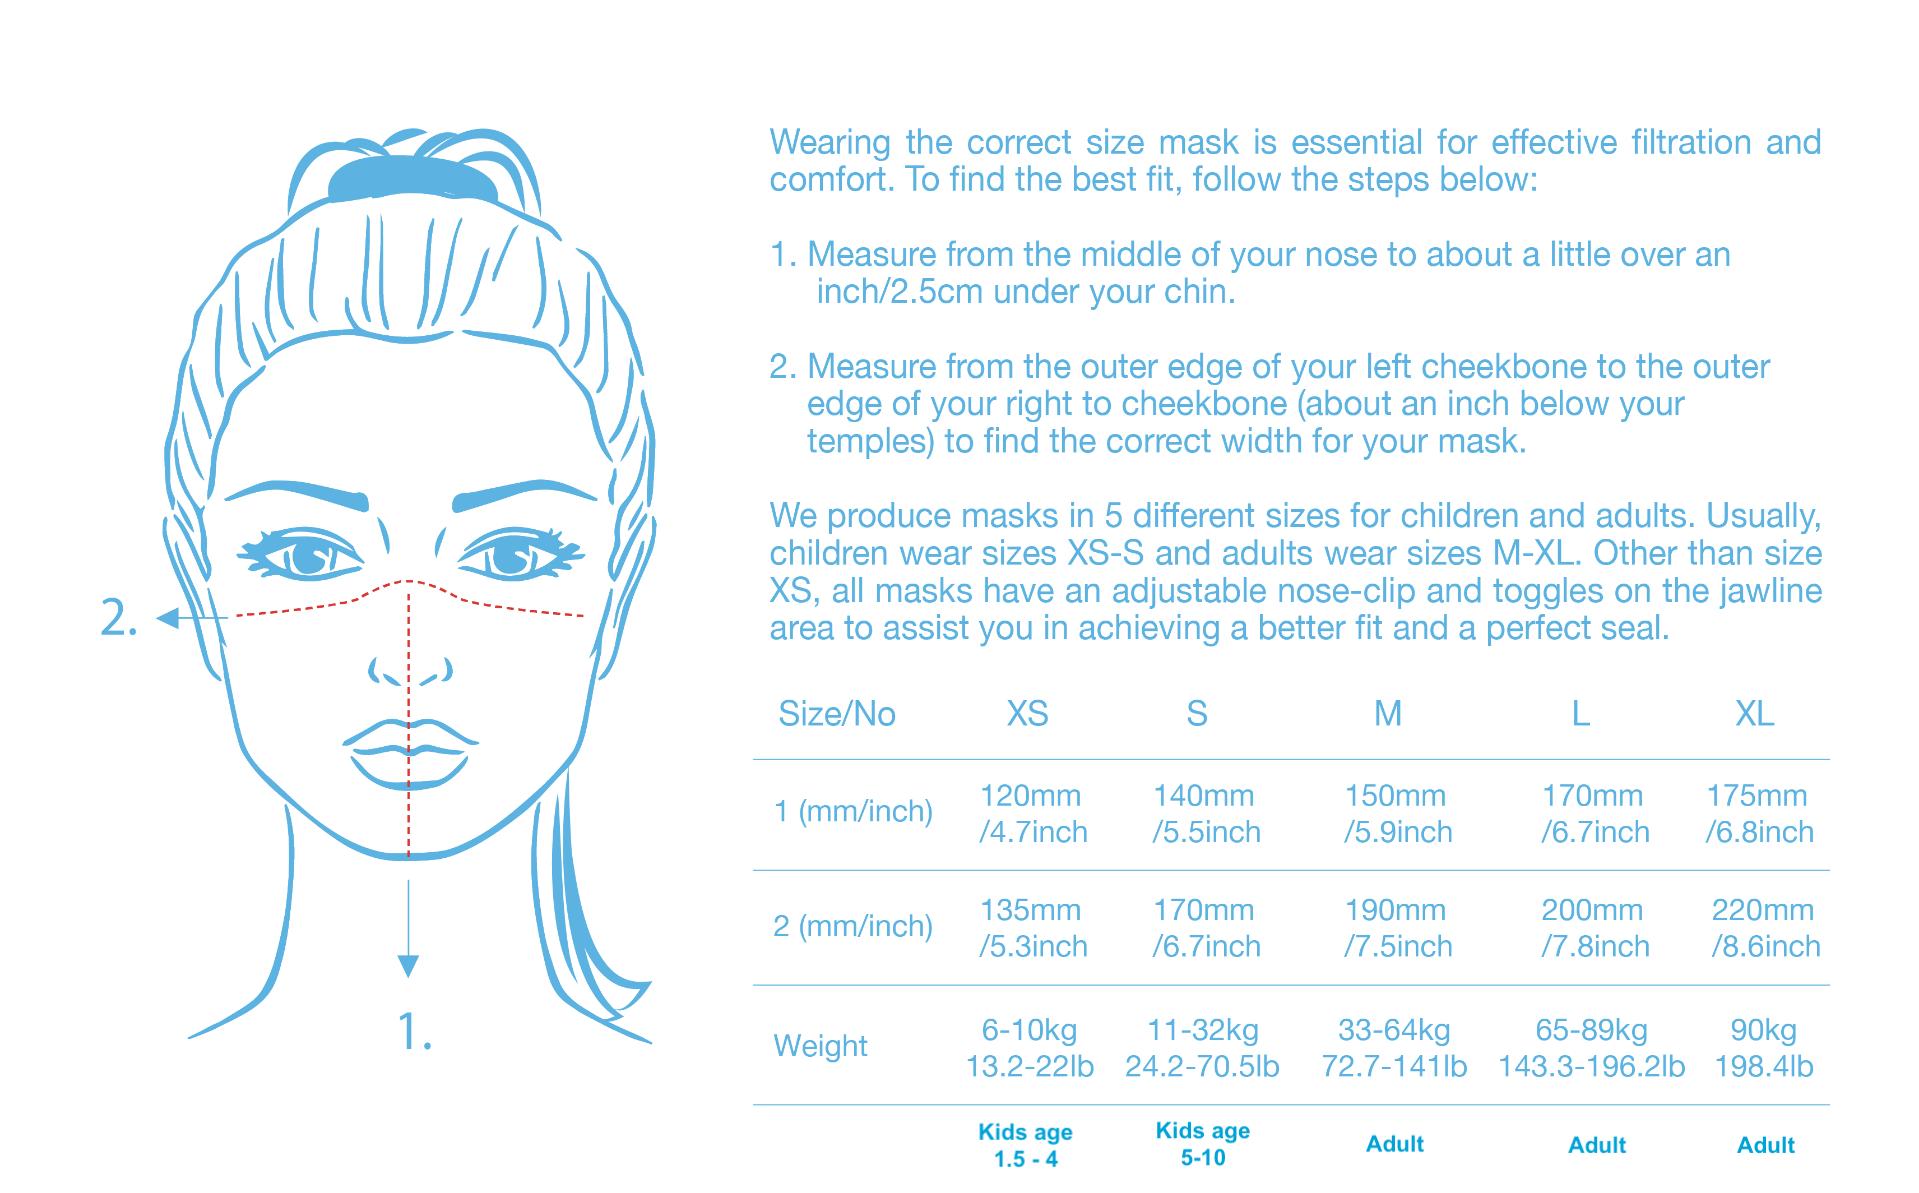 Cambridge Mask size chart